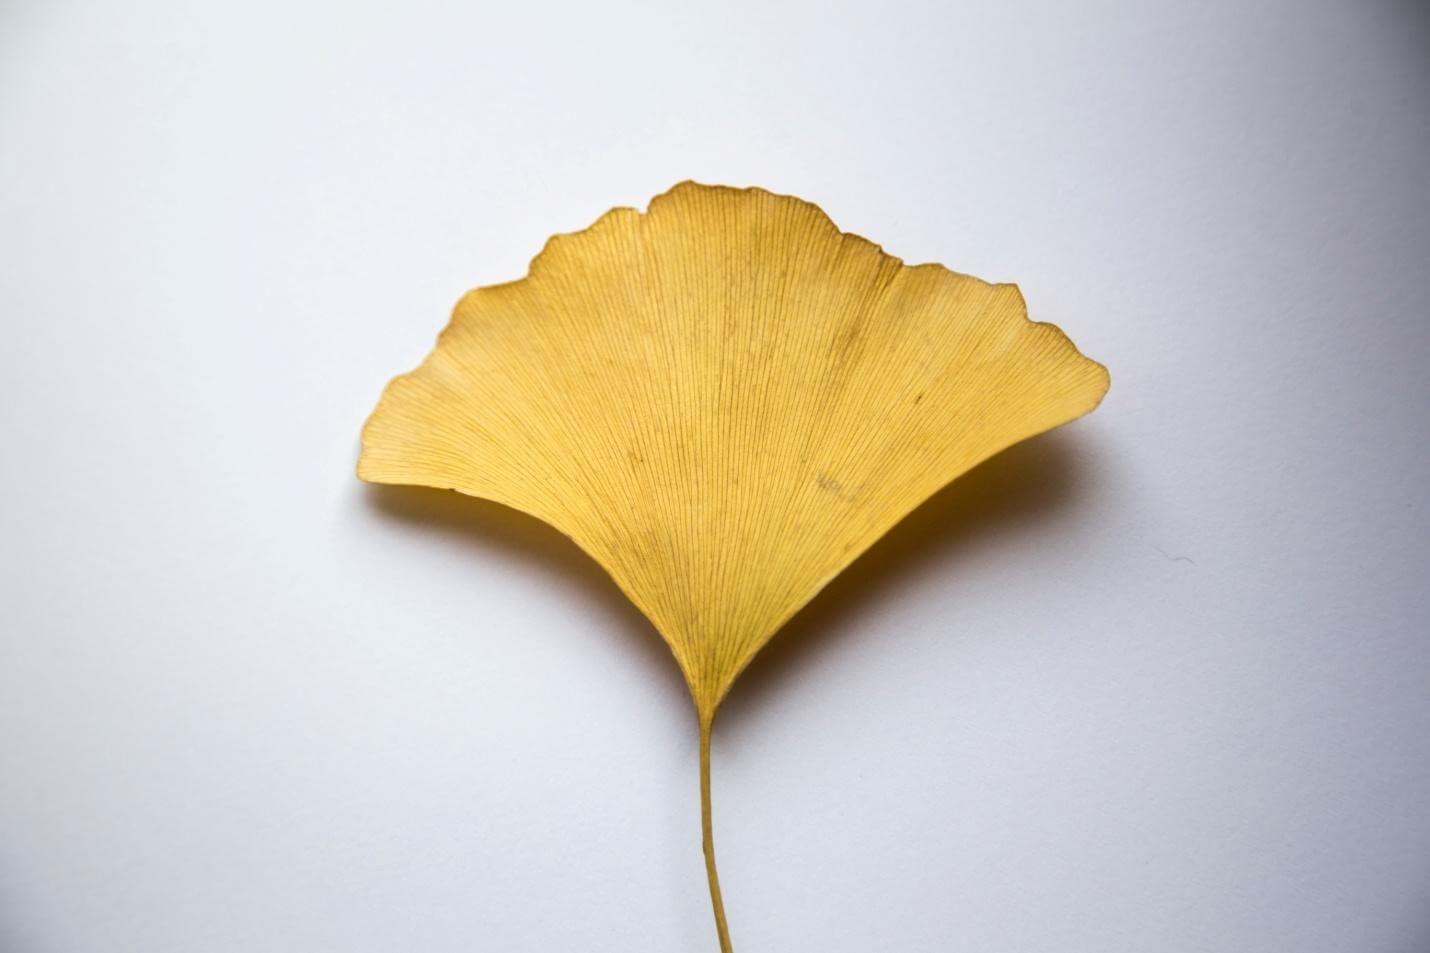 Ginkgo, types of medicinal plants